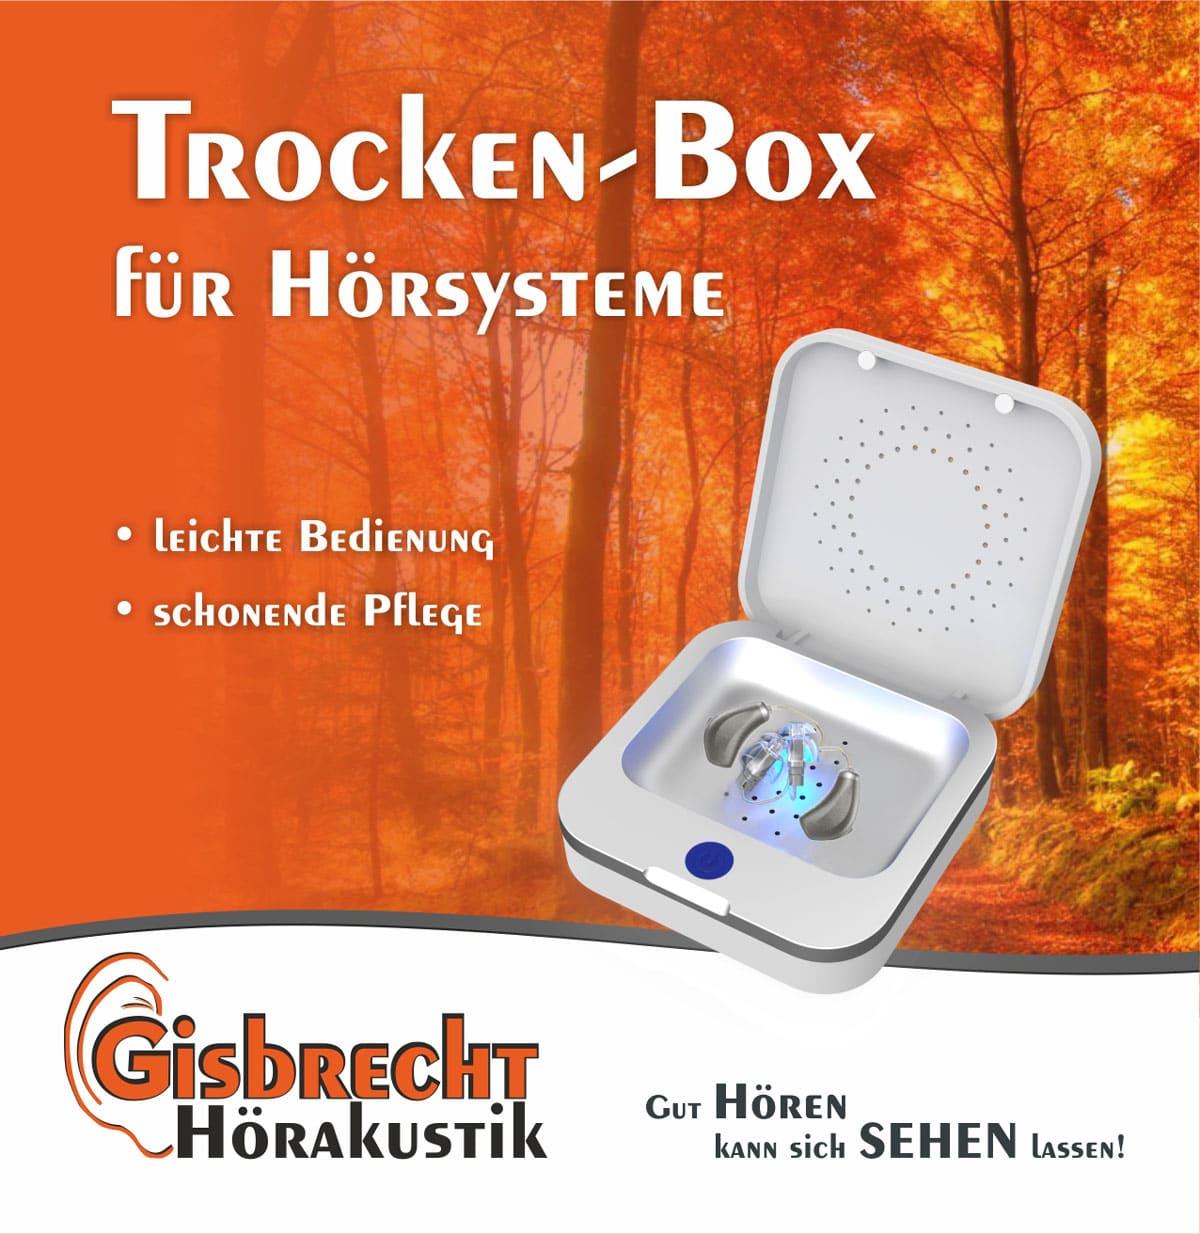 Starkey Trockenbox für Hörgeräte - Gisbrecht Hörakustik